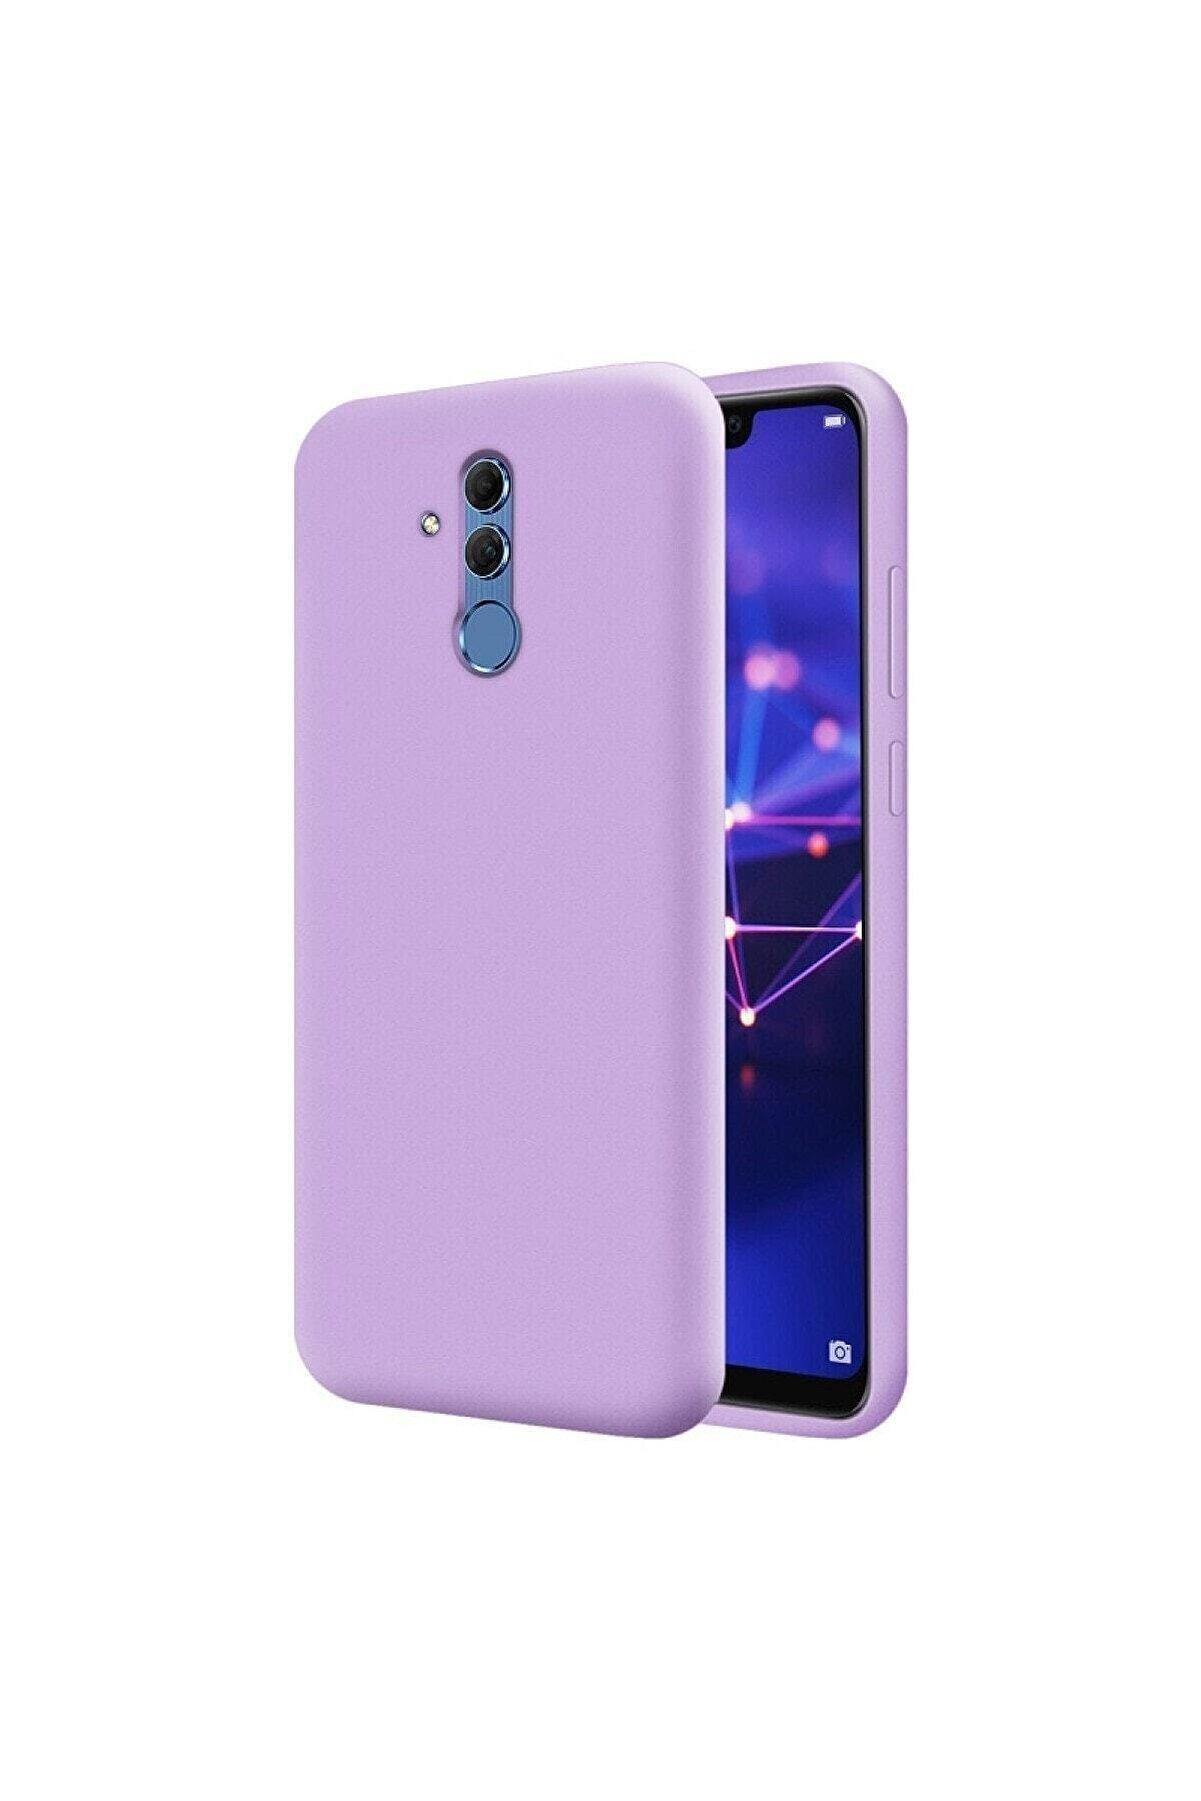 Bilişim Aksesuar Huawei Mate 20 Lite Lansman Silikon Kılıf